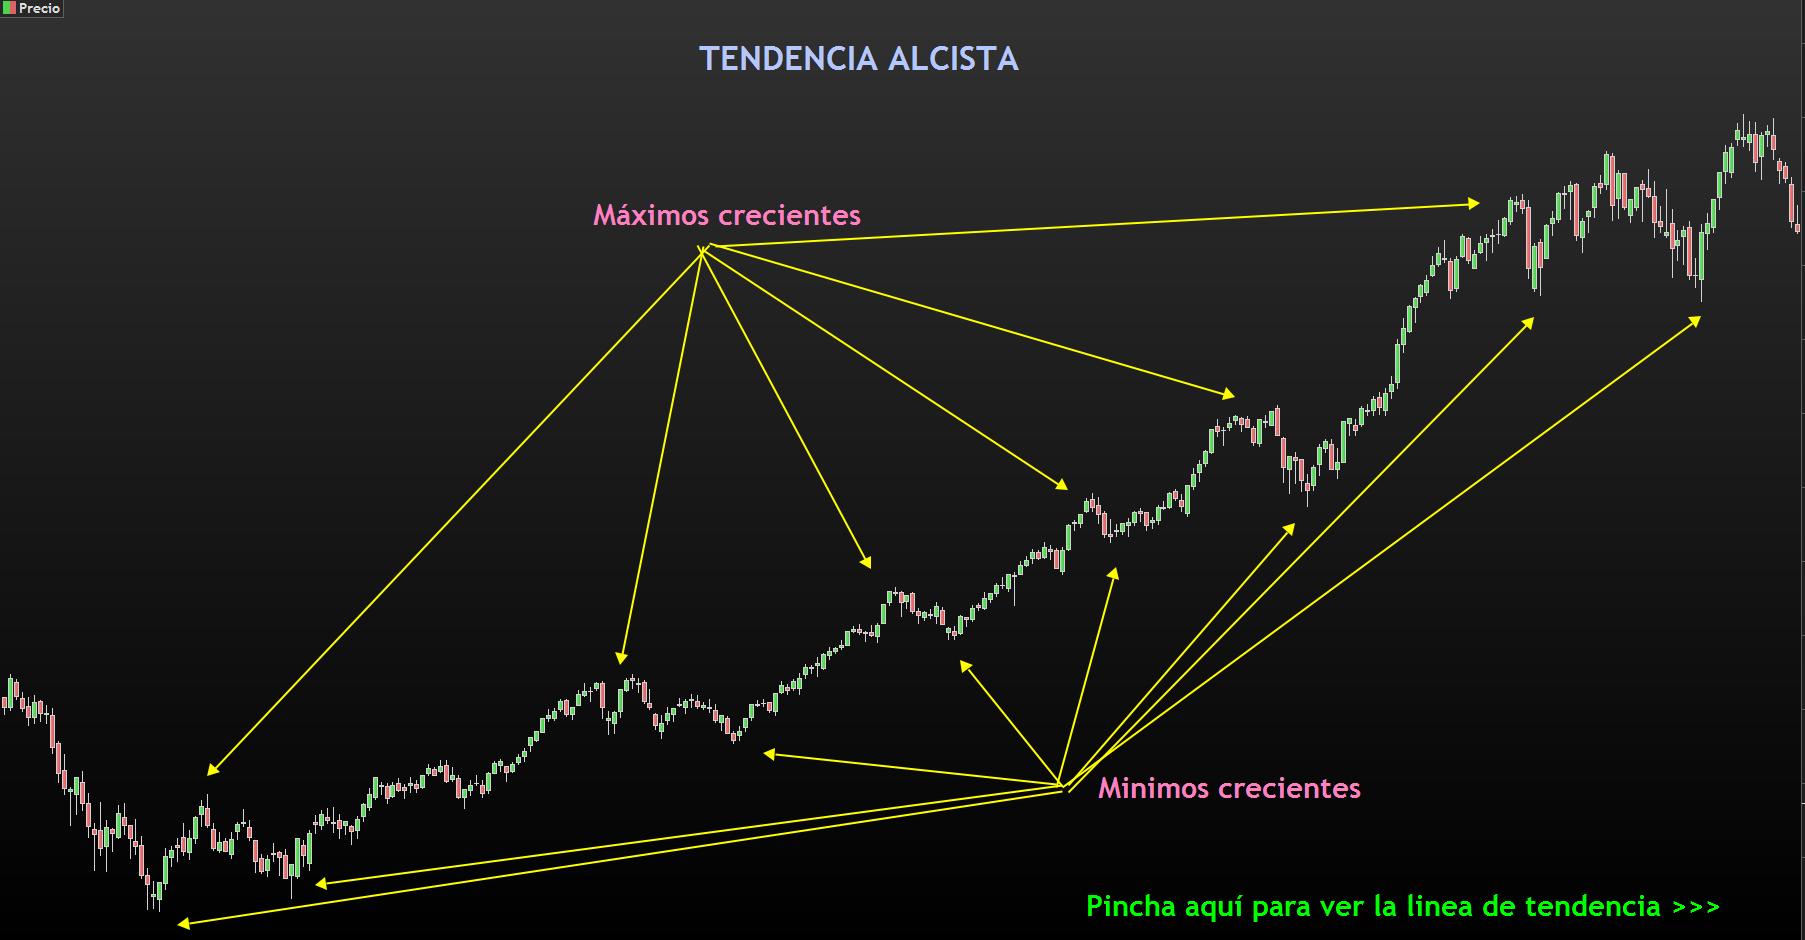 TENDENCIA ALCISTA